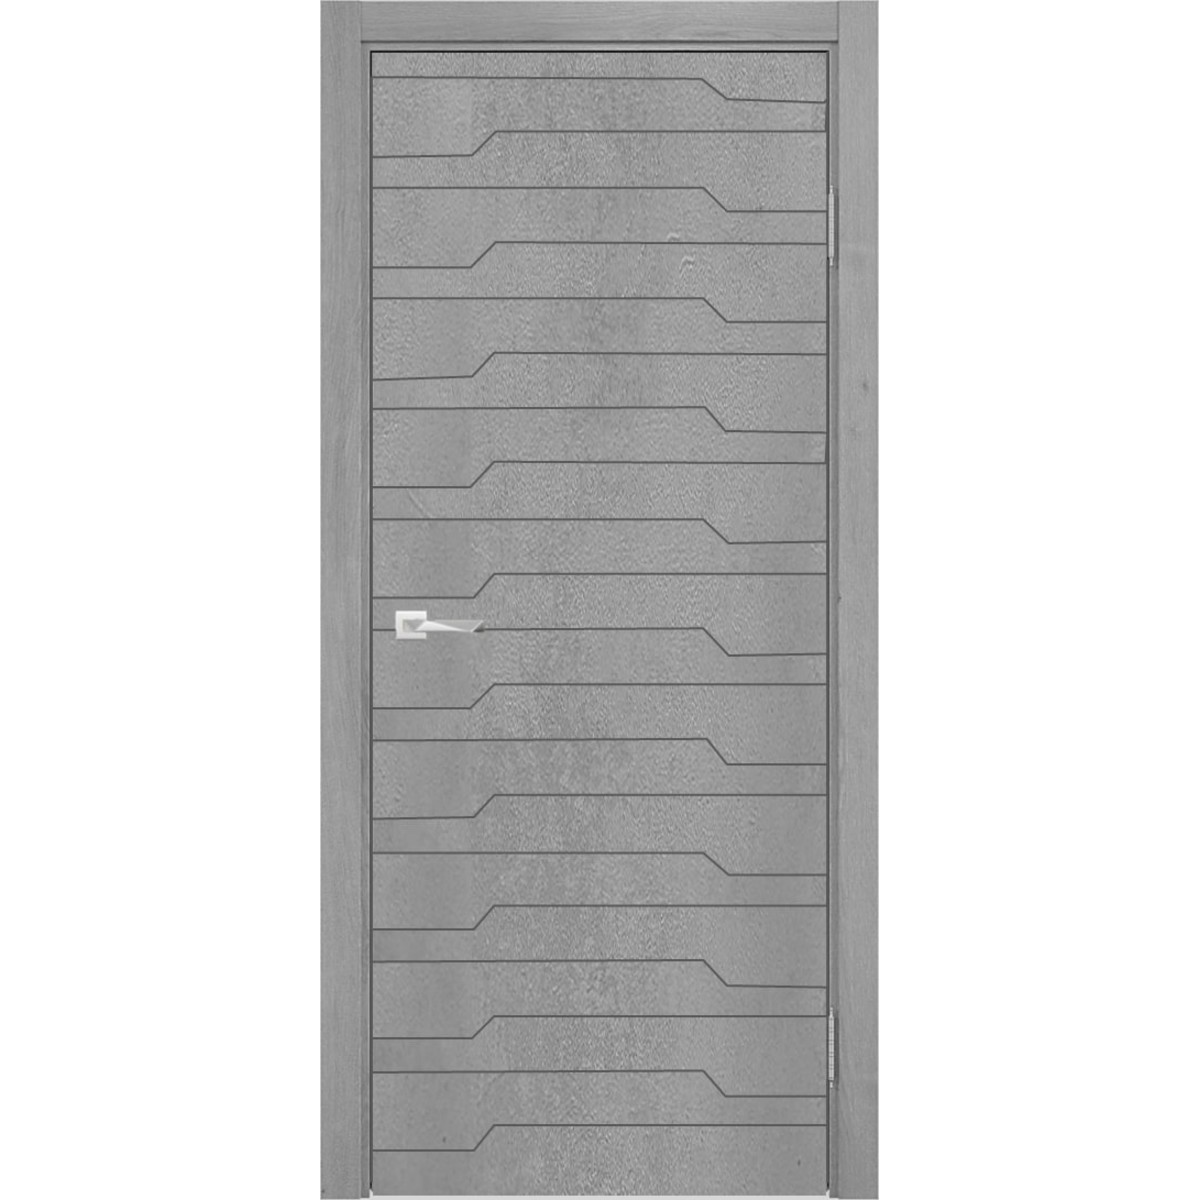 Дверное полотно Loyard Севилья МП_0386 2000х800х44 мм МДФ